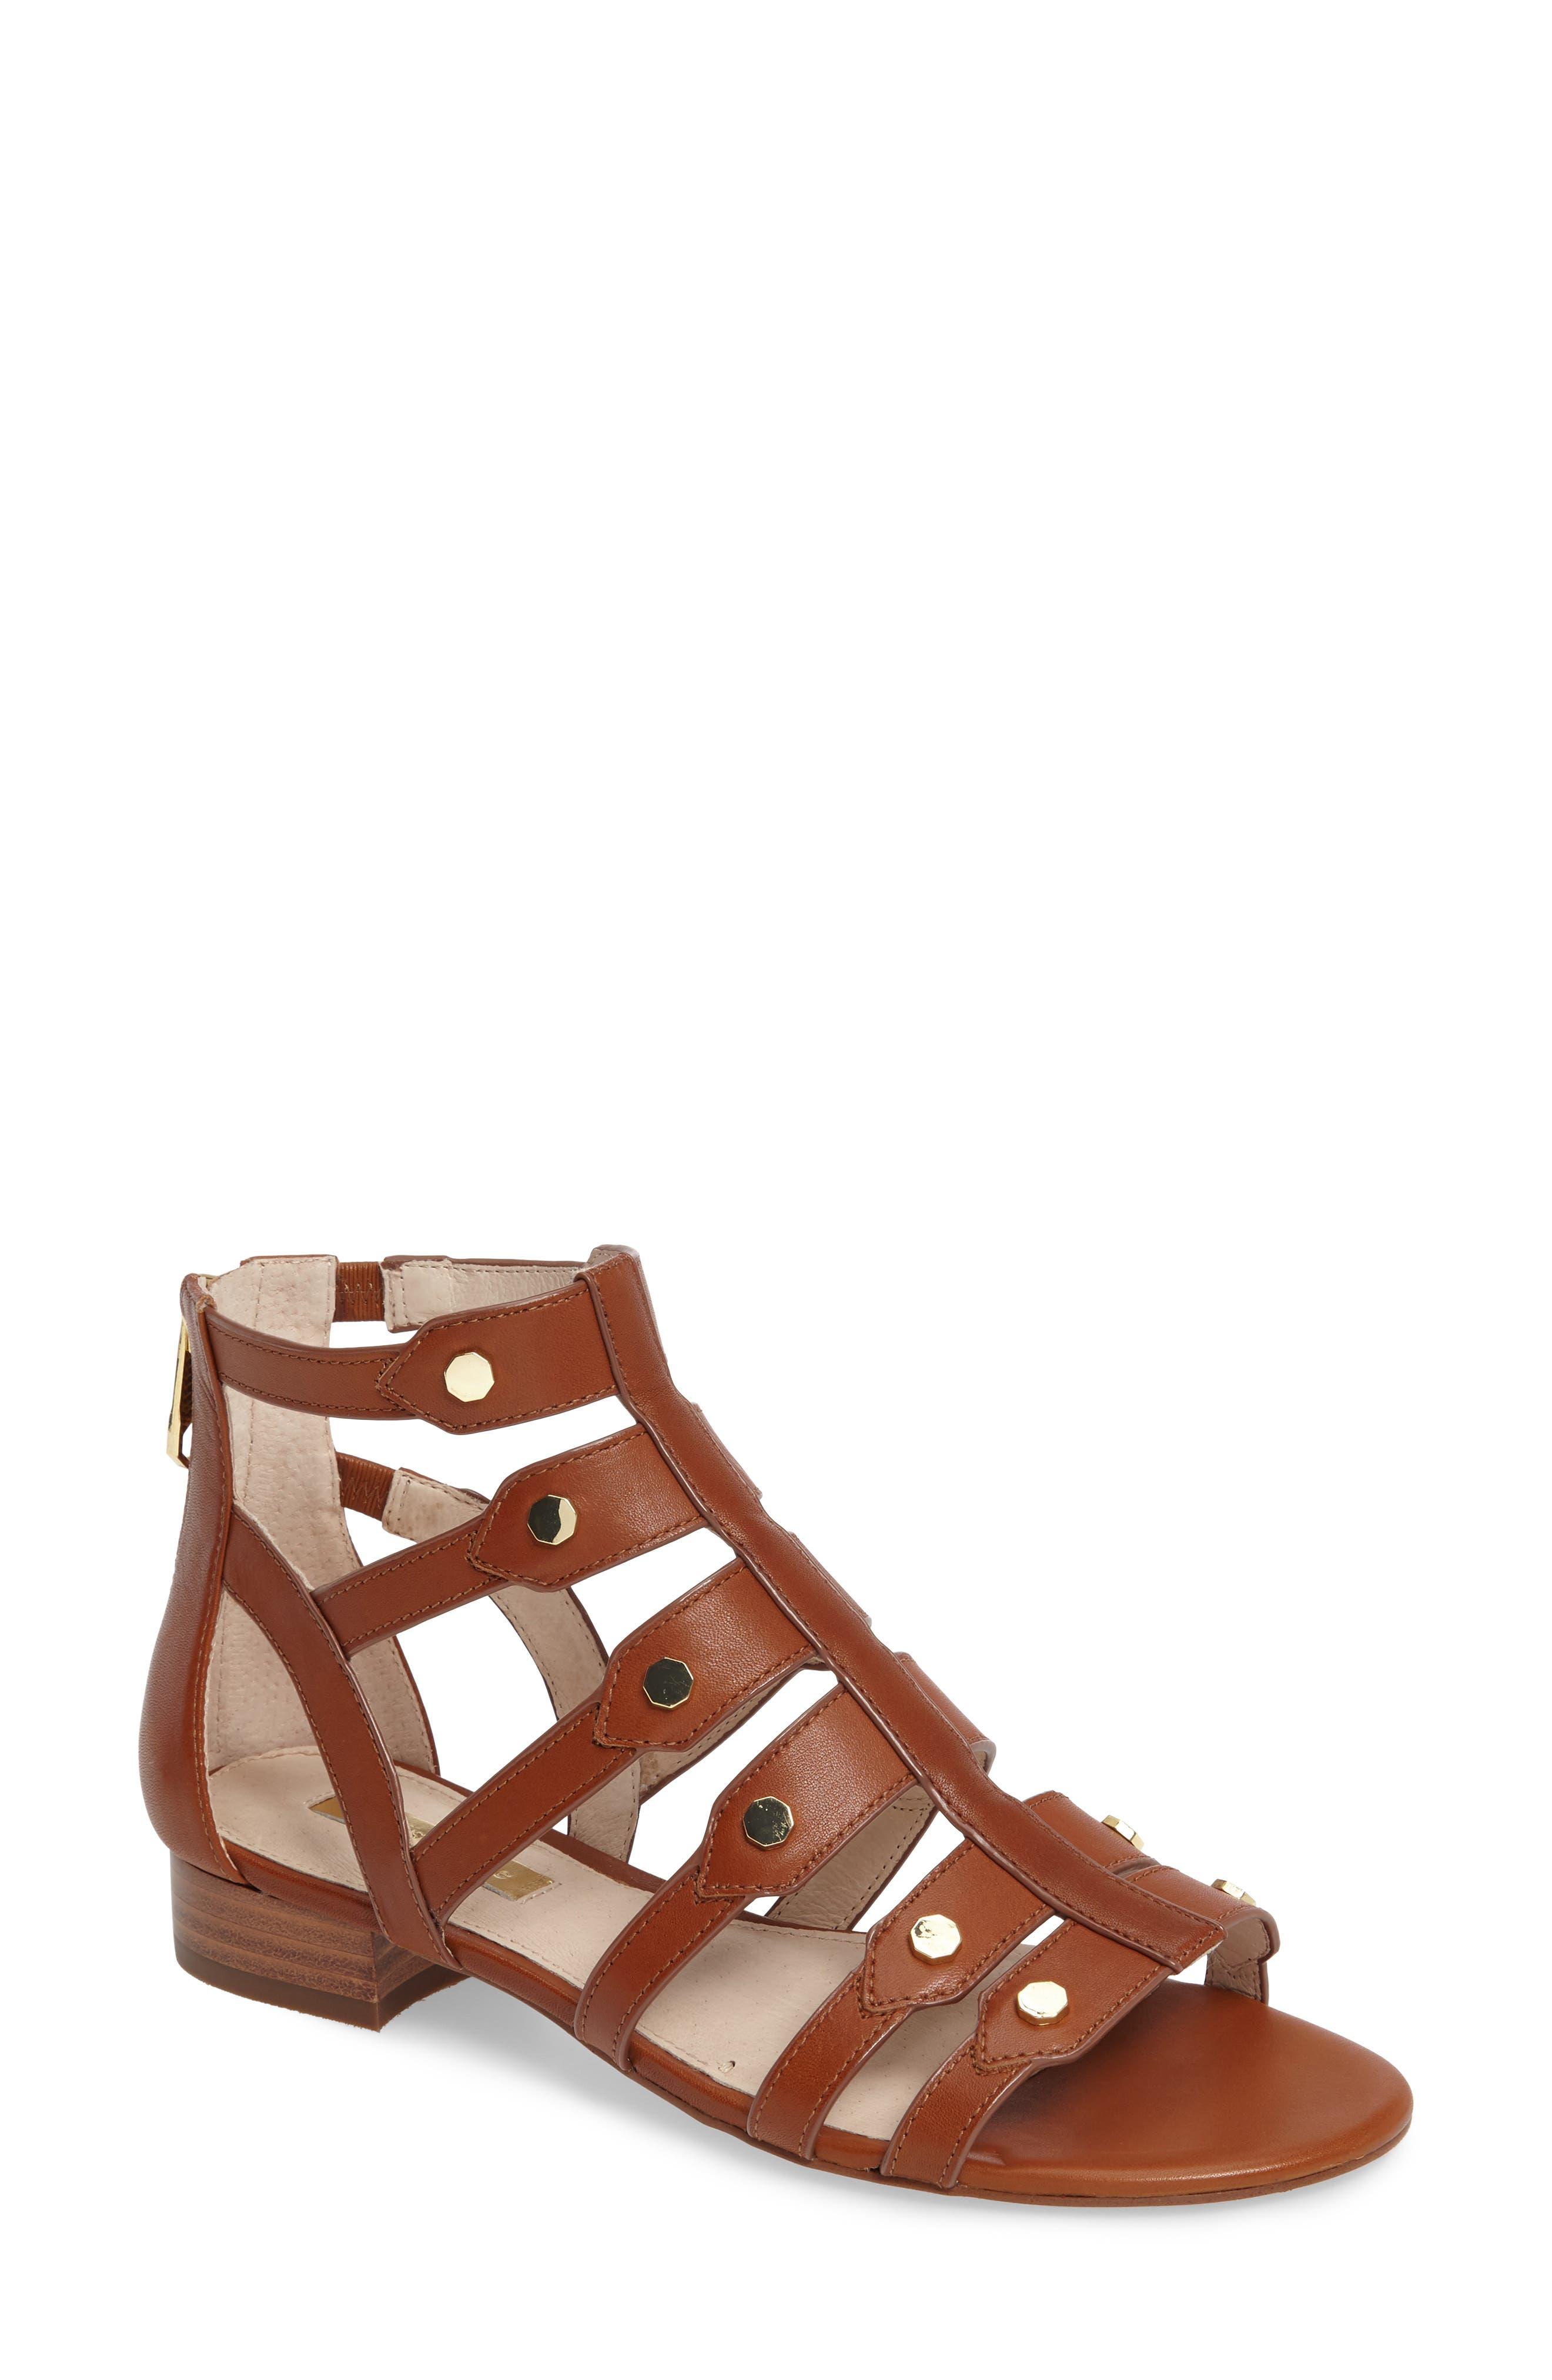 Main Image - Louise et Cie Aria Studded Gladiator Sandal (Women)